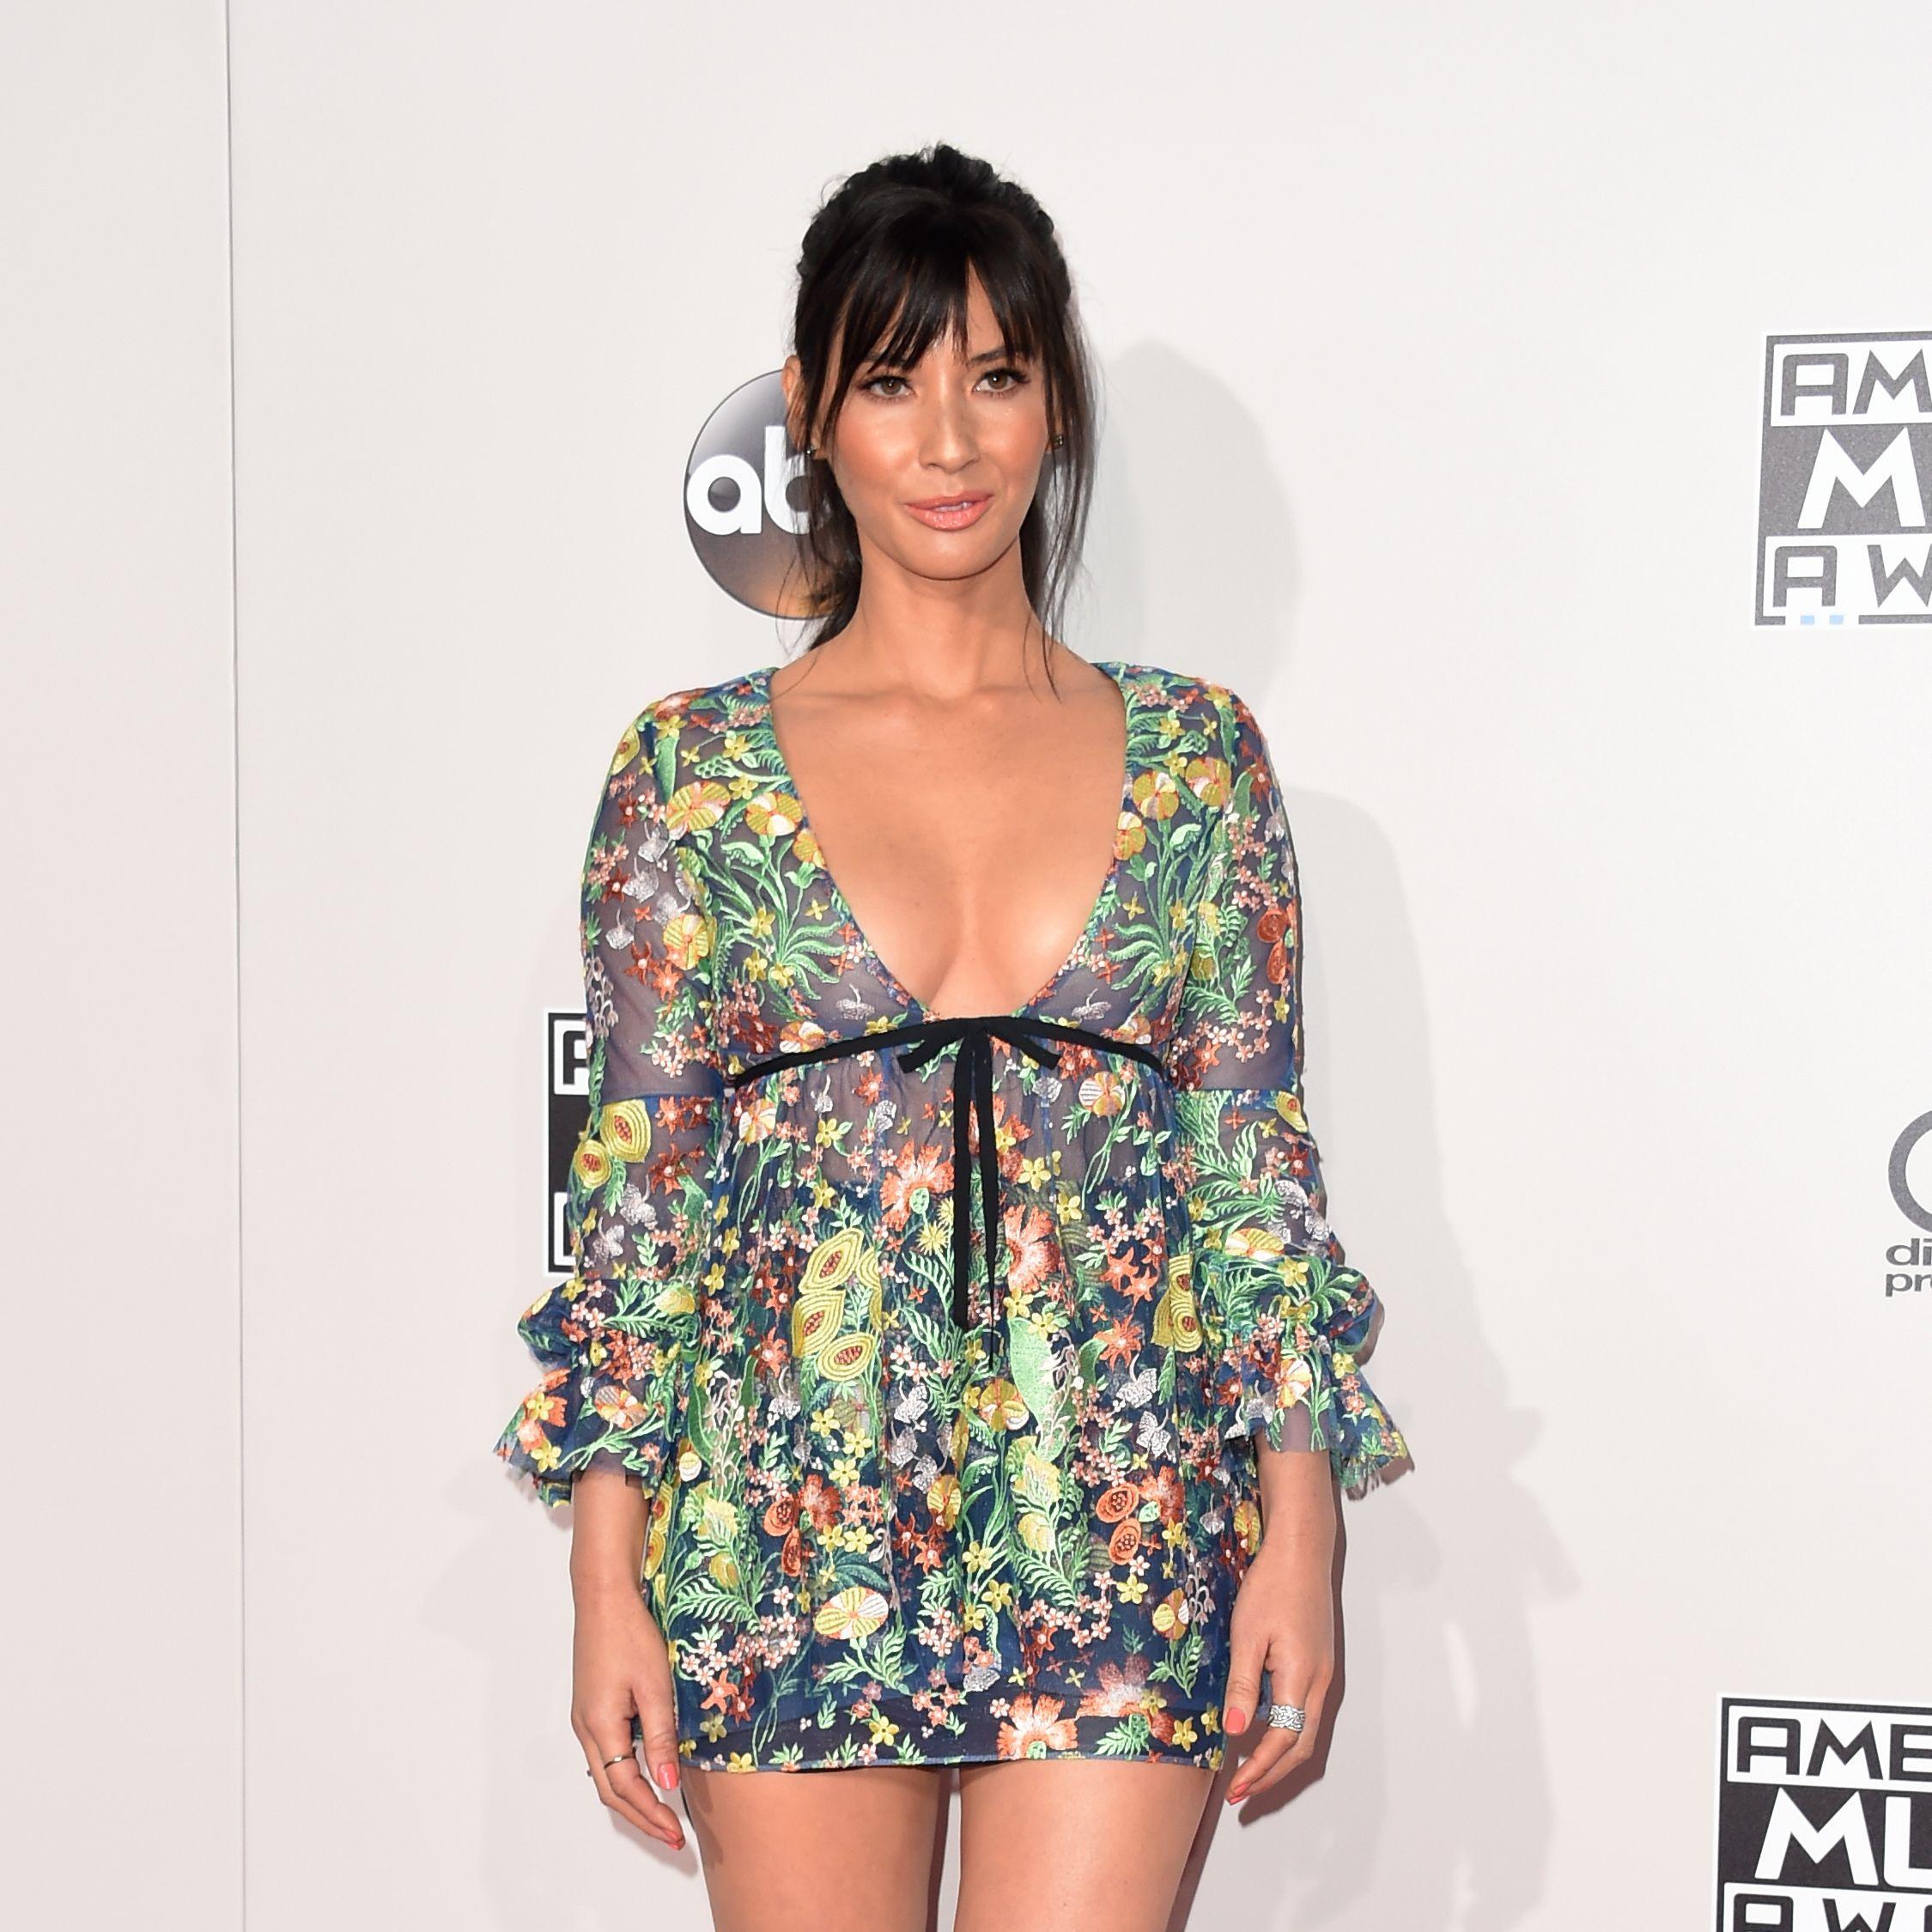 celeb fashion at the 2016 AMAs red carpet